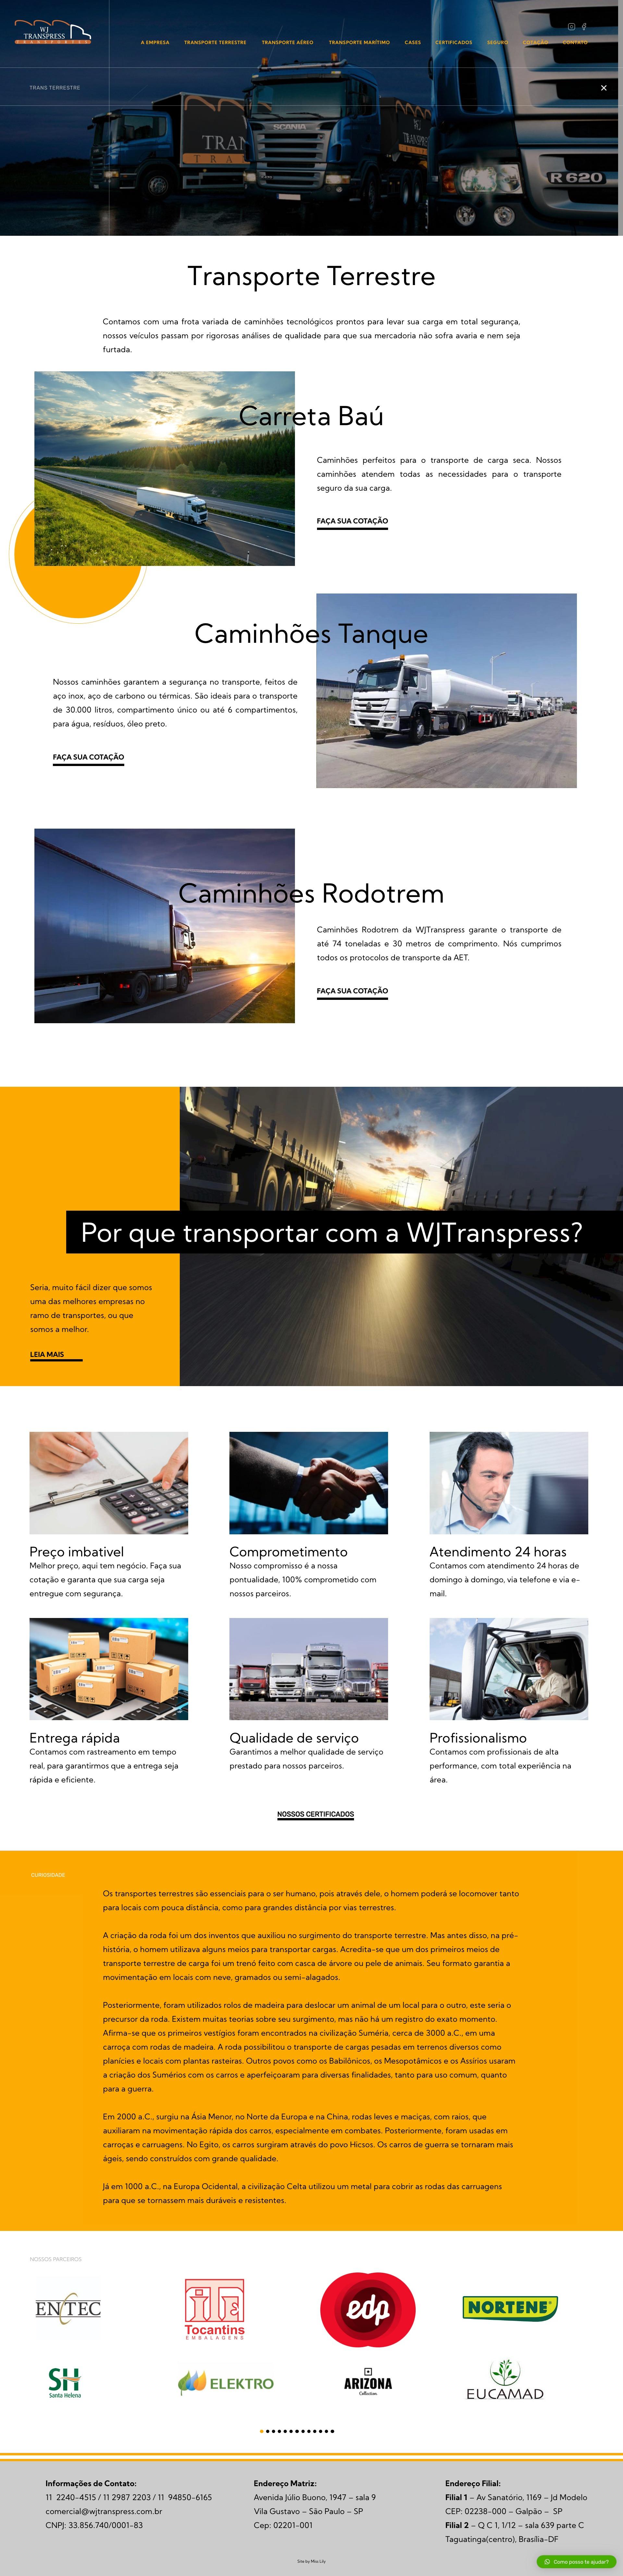 4- Transporte Terrestre - WJ Transpress - Transportadora